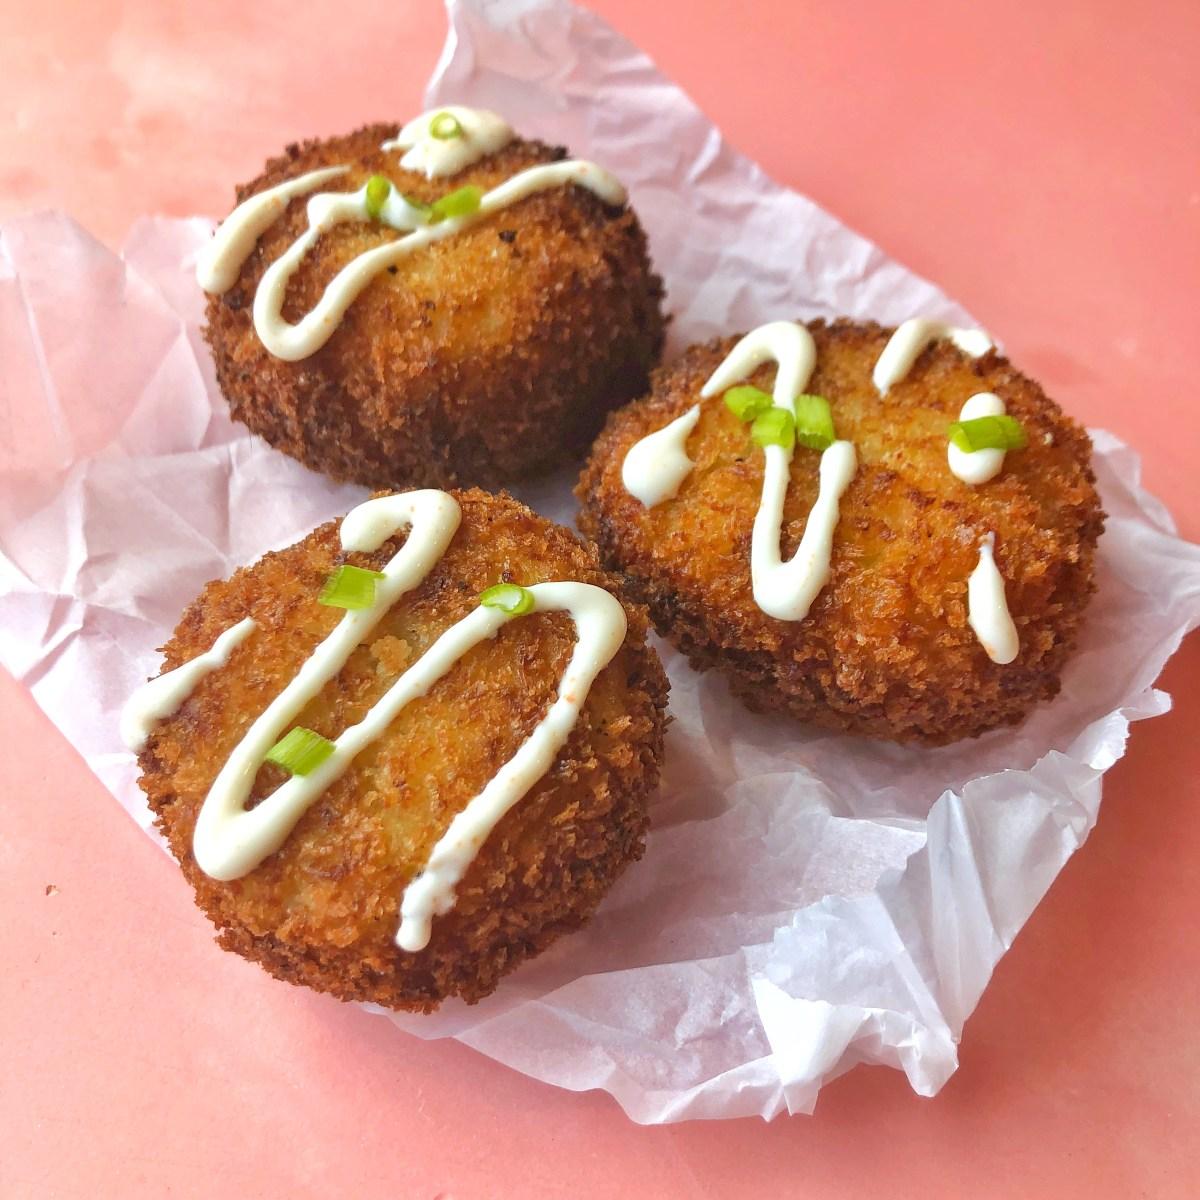 Loaded Mashed Potato Balls with Chili Honey Sour Cream